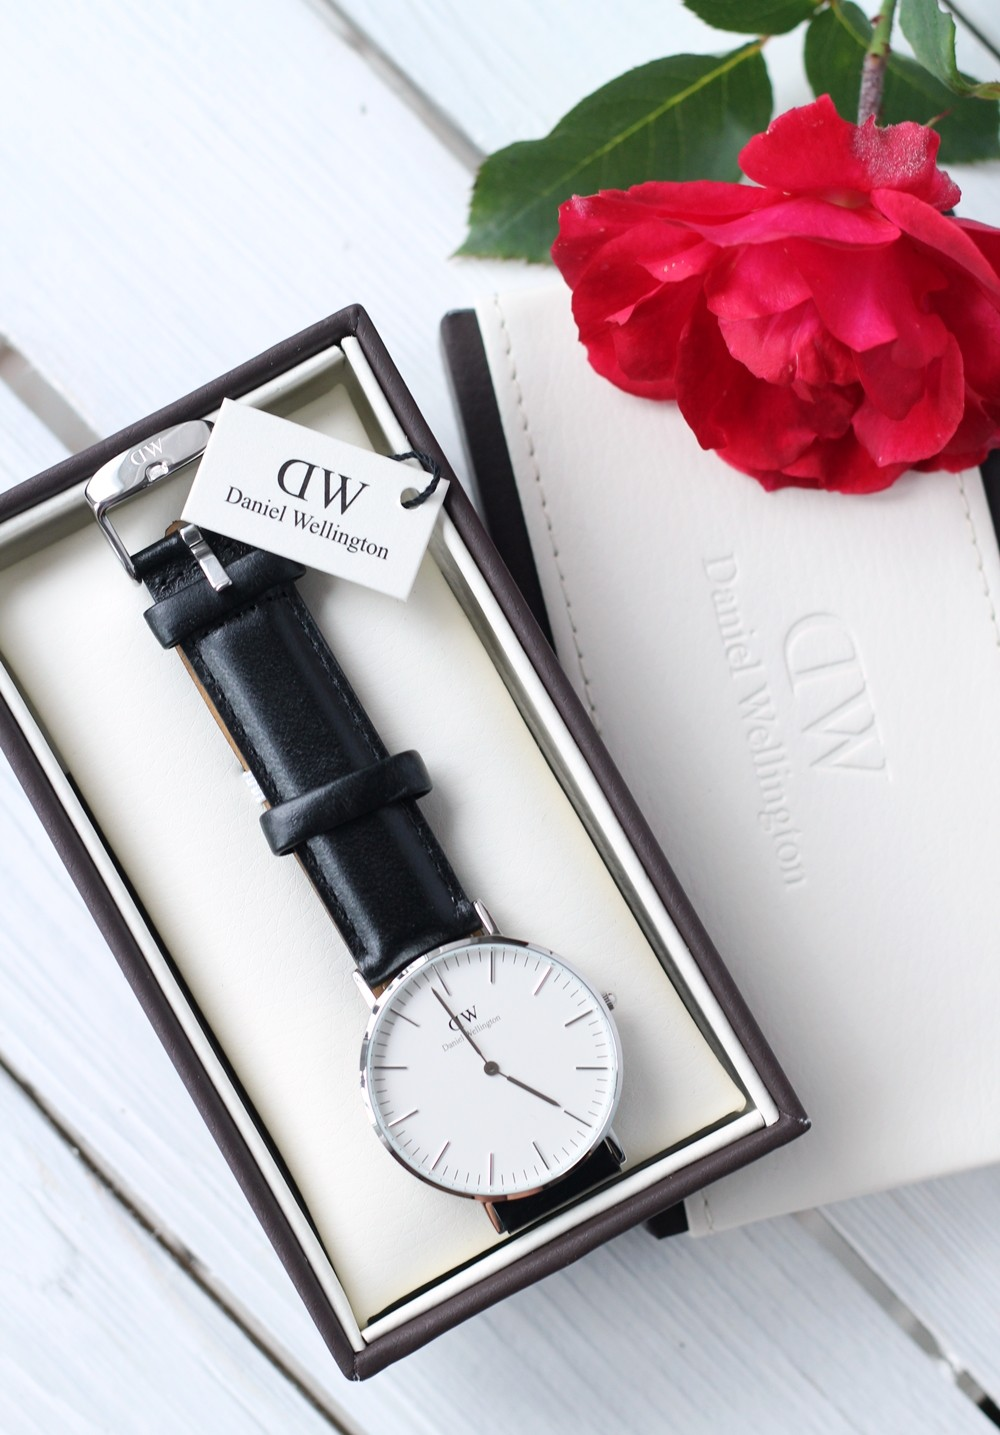 Fashionblogger Karlsruhe Daniel Wellington Uhr klassisch schwarz silber 1